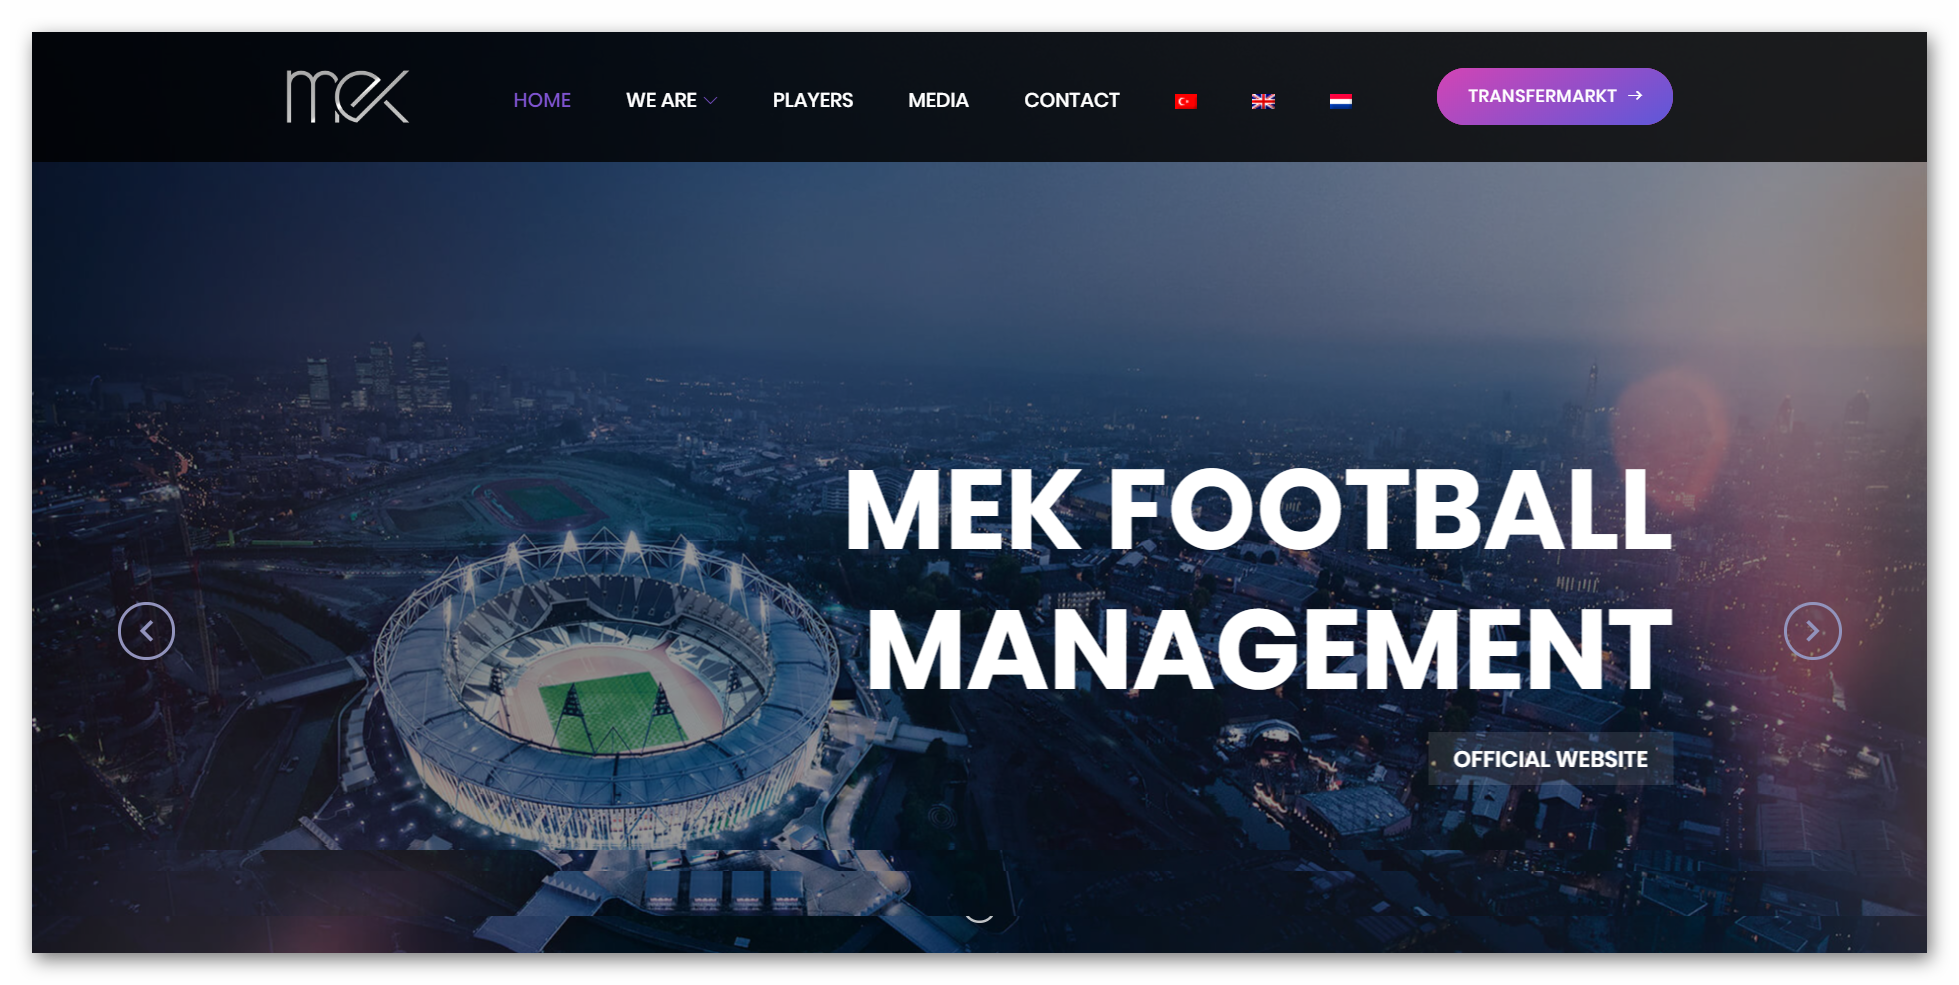 Mekfootball